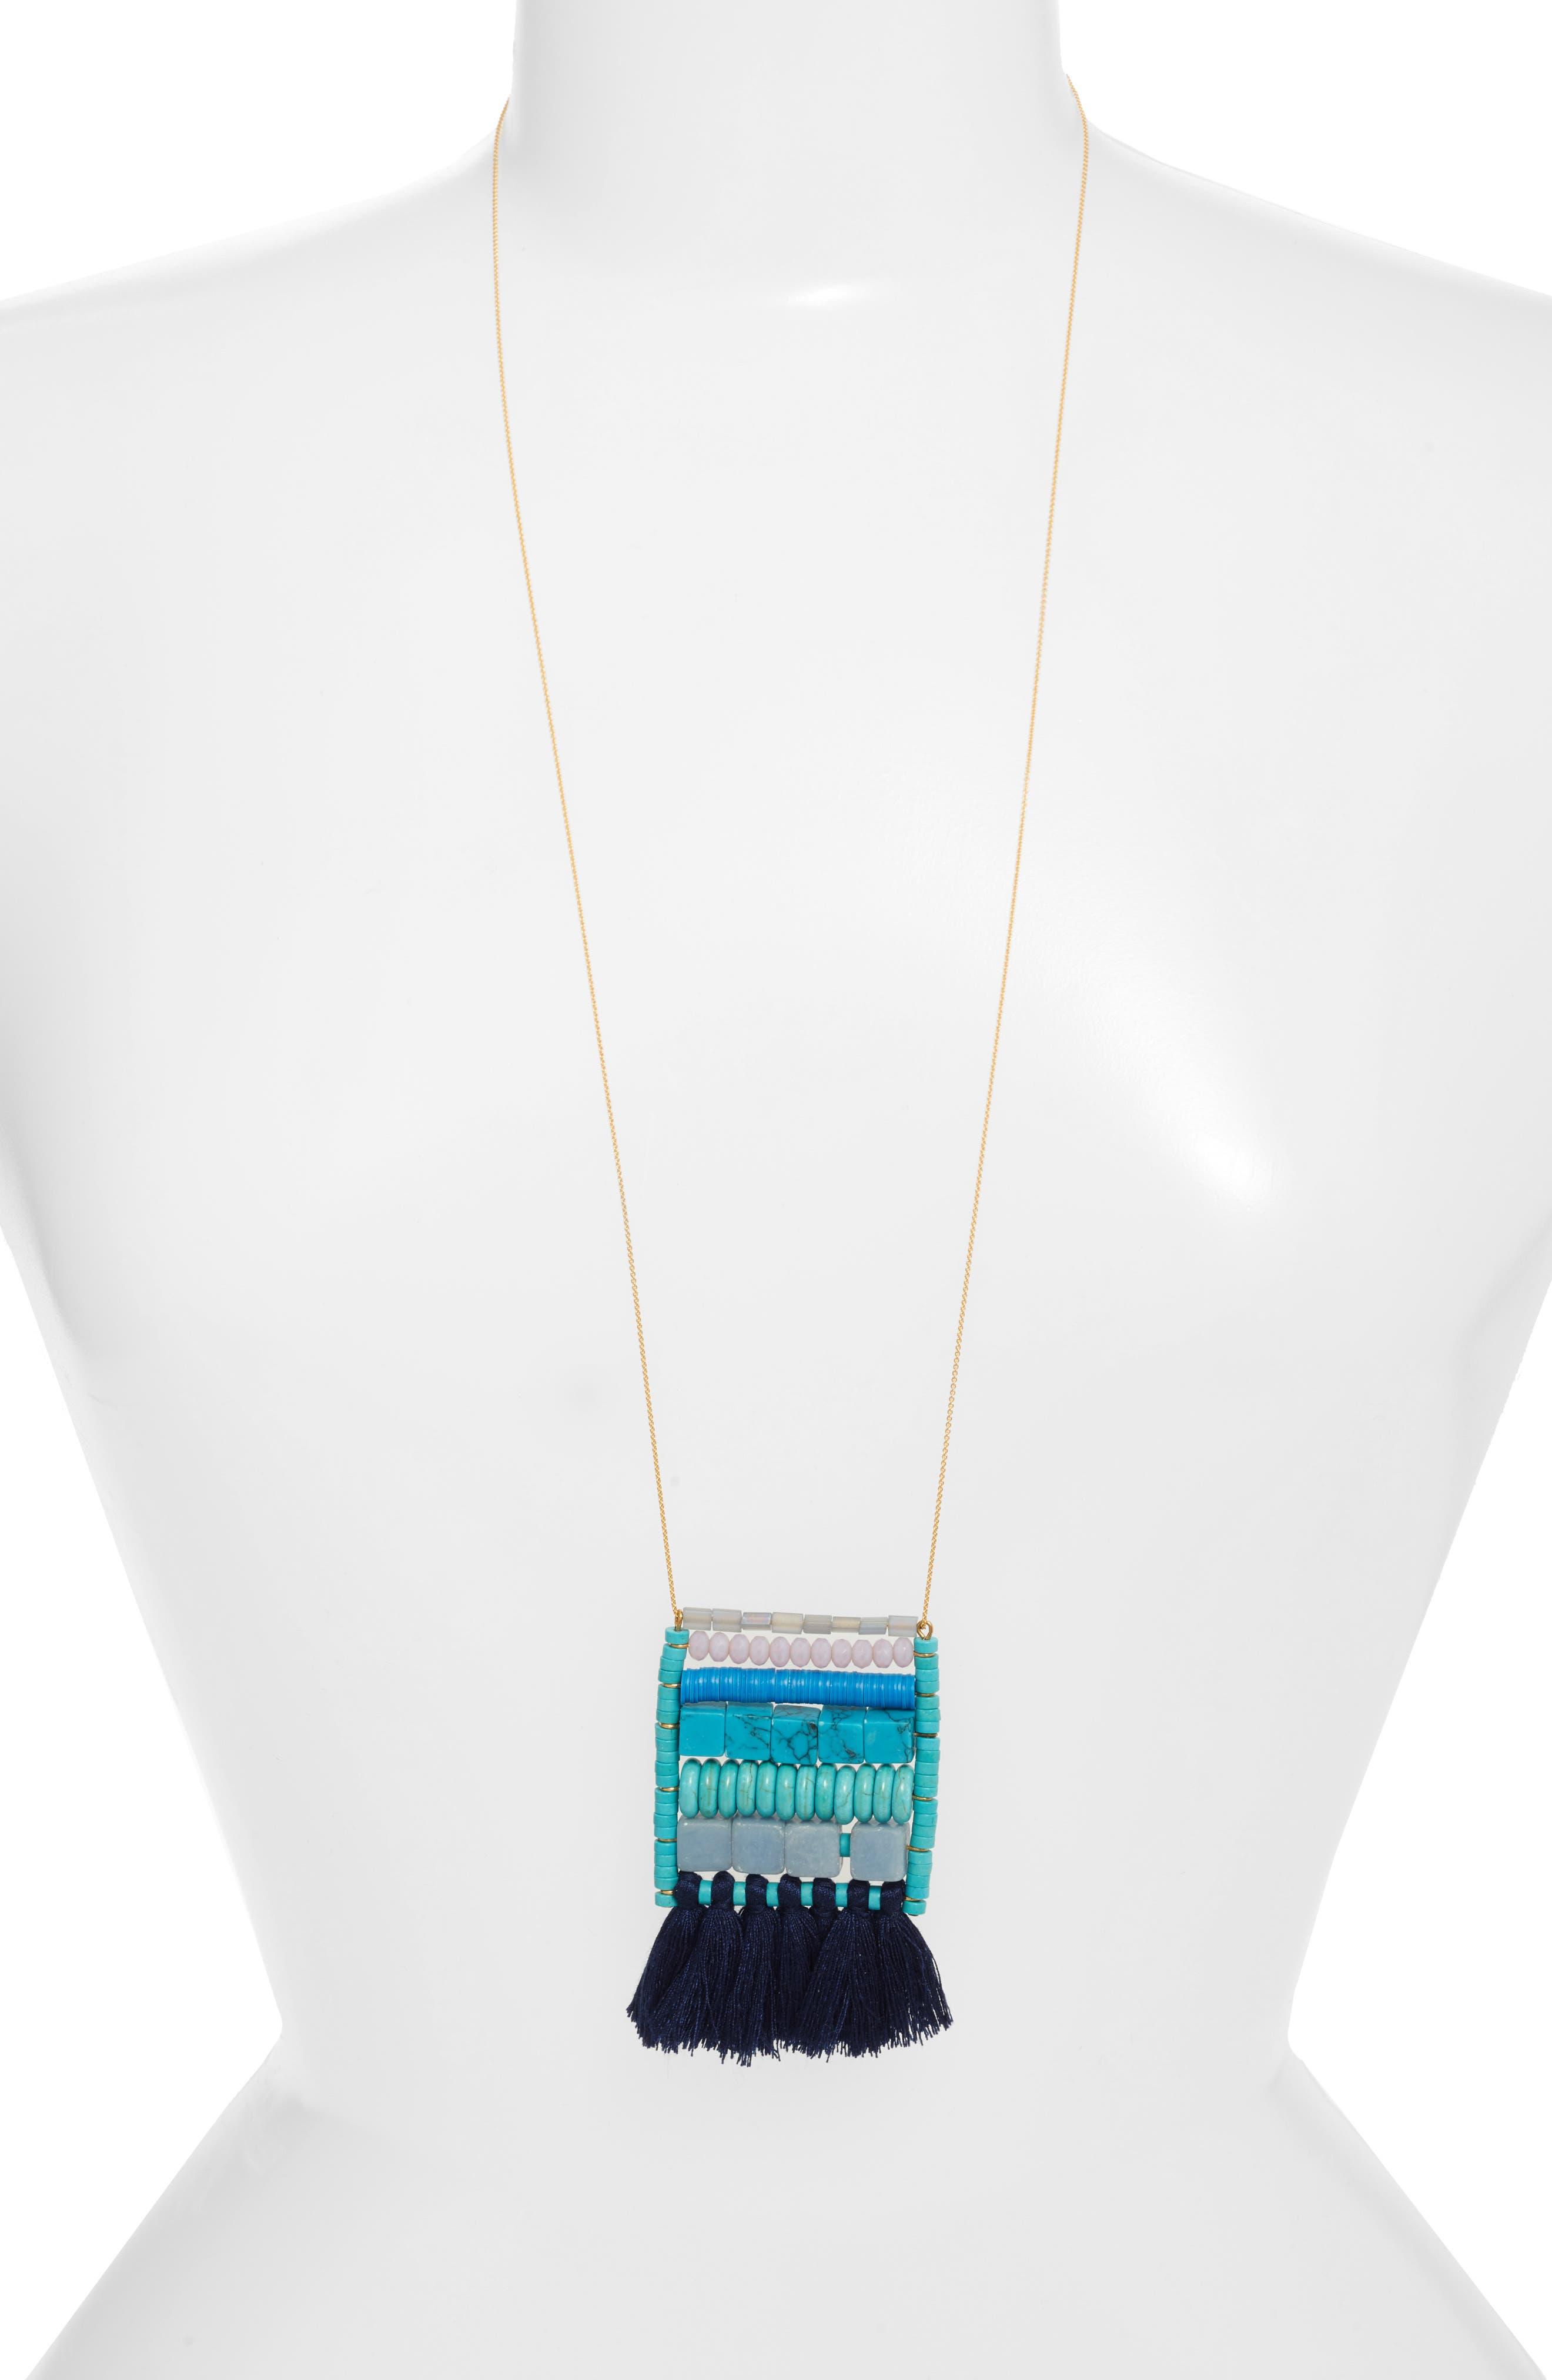 Main Image - David Aubrey Rylee Tassel Pendant Necklace